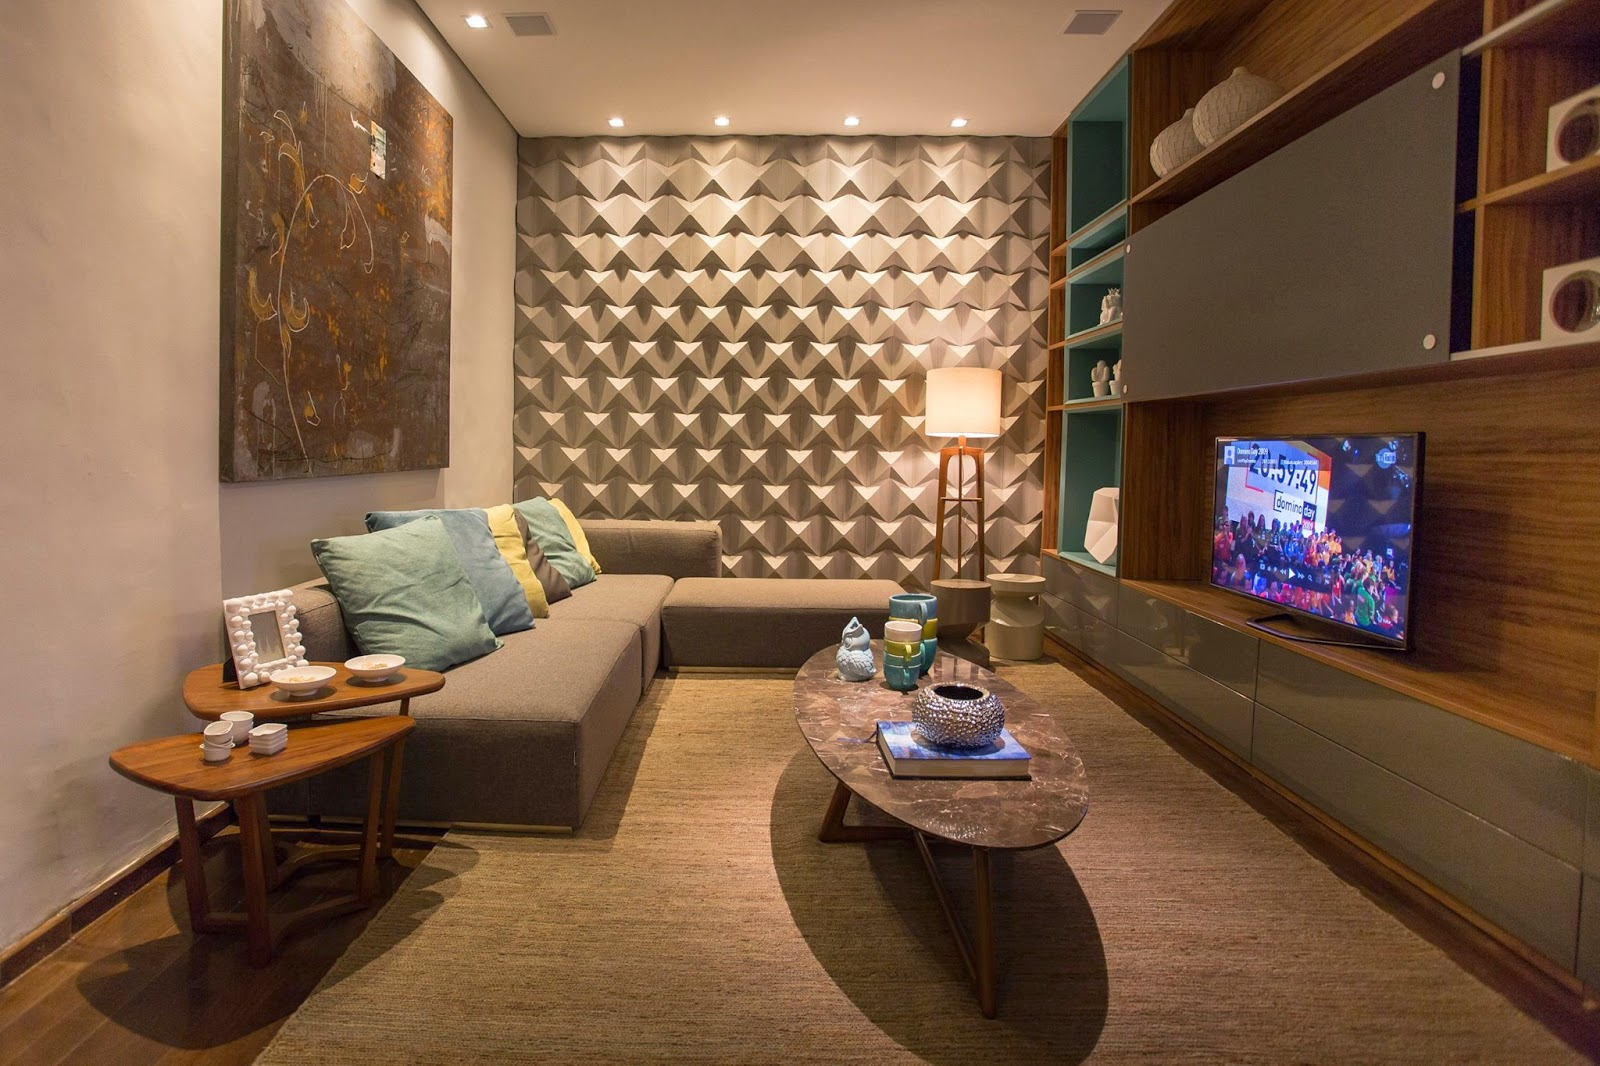 HOGARISIMO Decoracion de salas pequeas y modernas